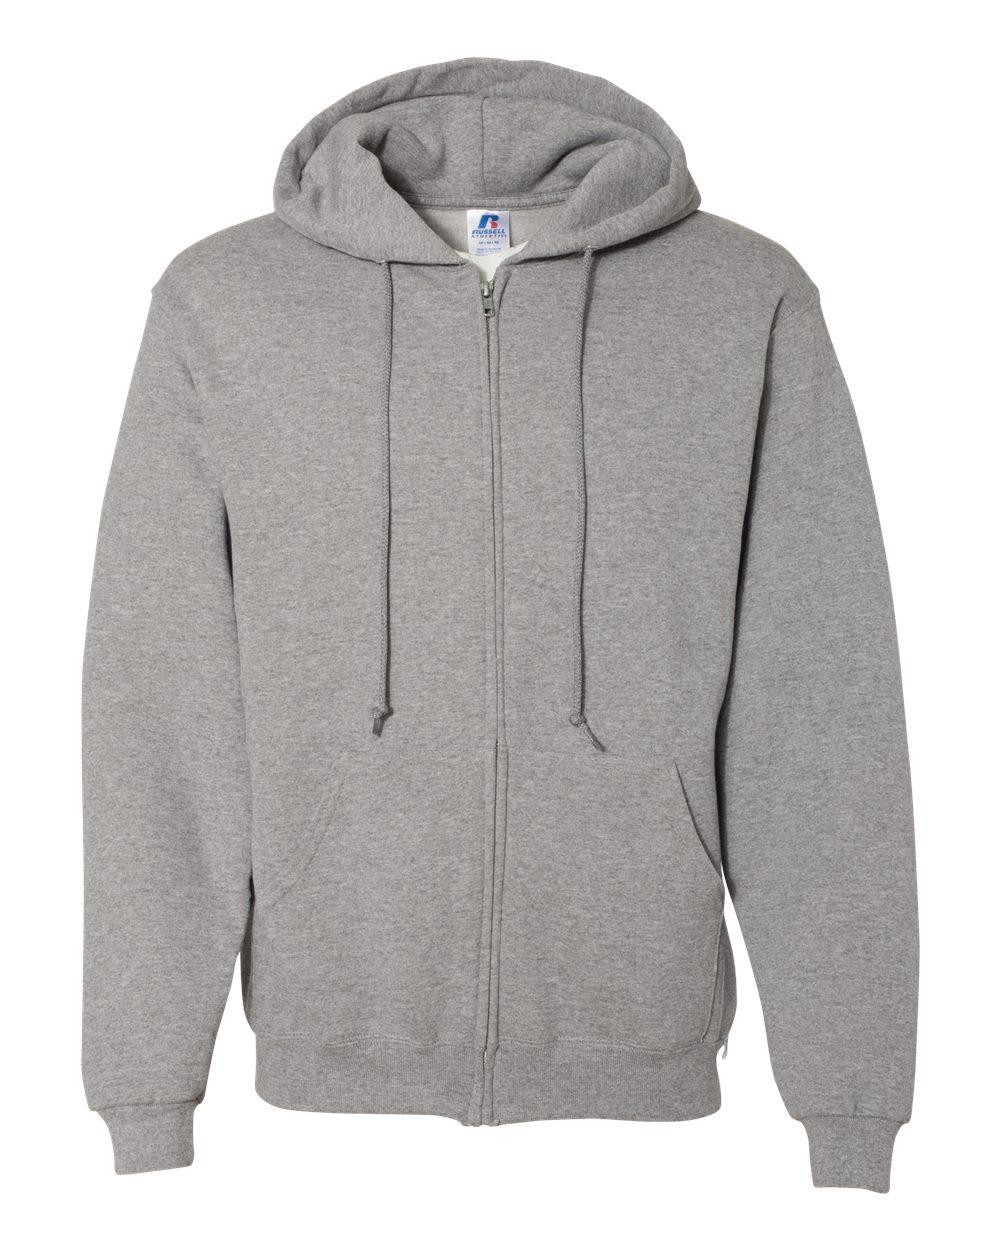 Russell-Athletic-Blank-Plain-Hooded-Full-Zip-Sweatshirt-697HBM-up-to-3XL thumbnail 12